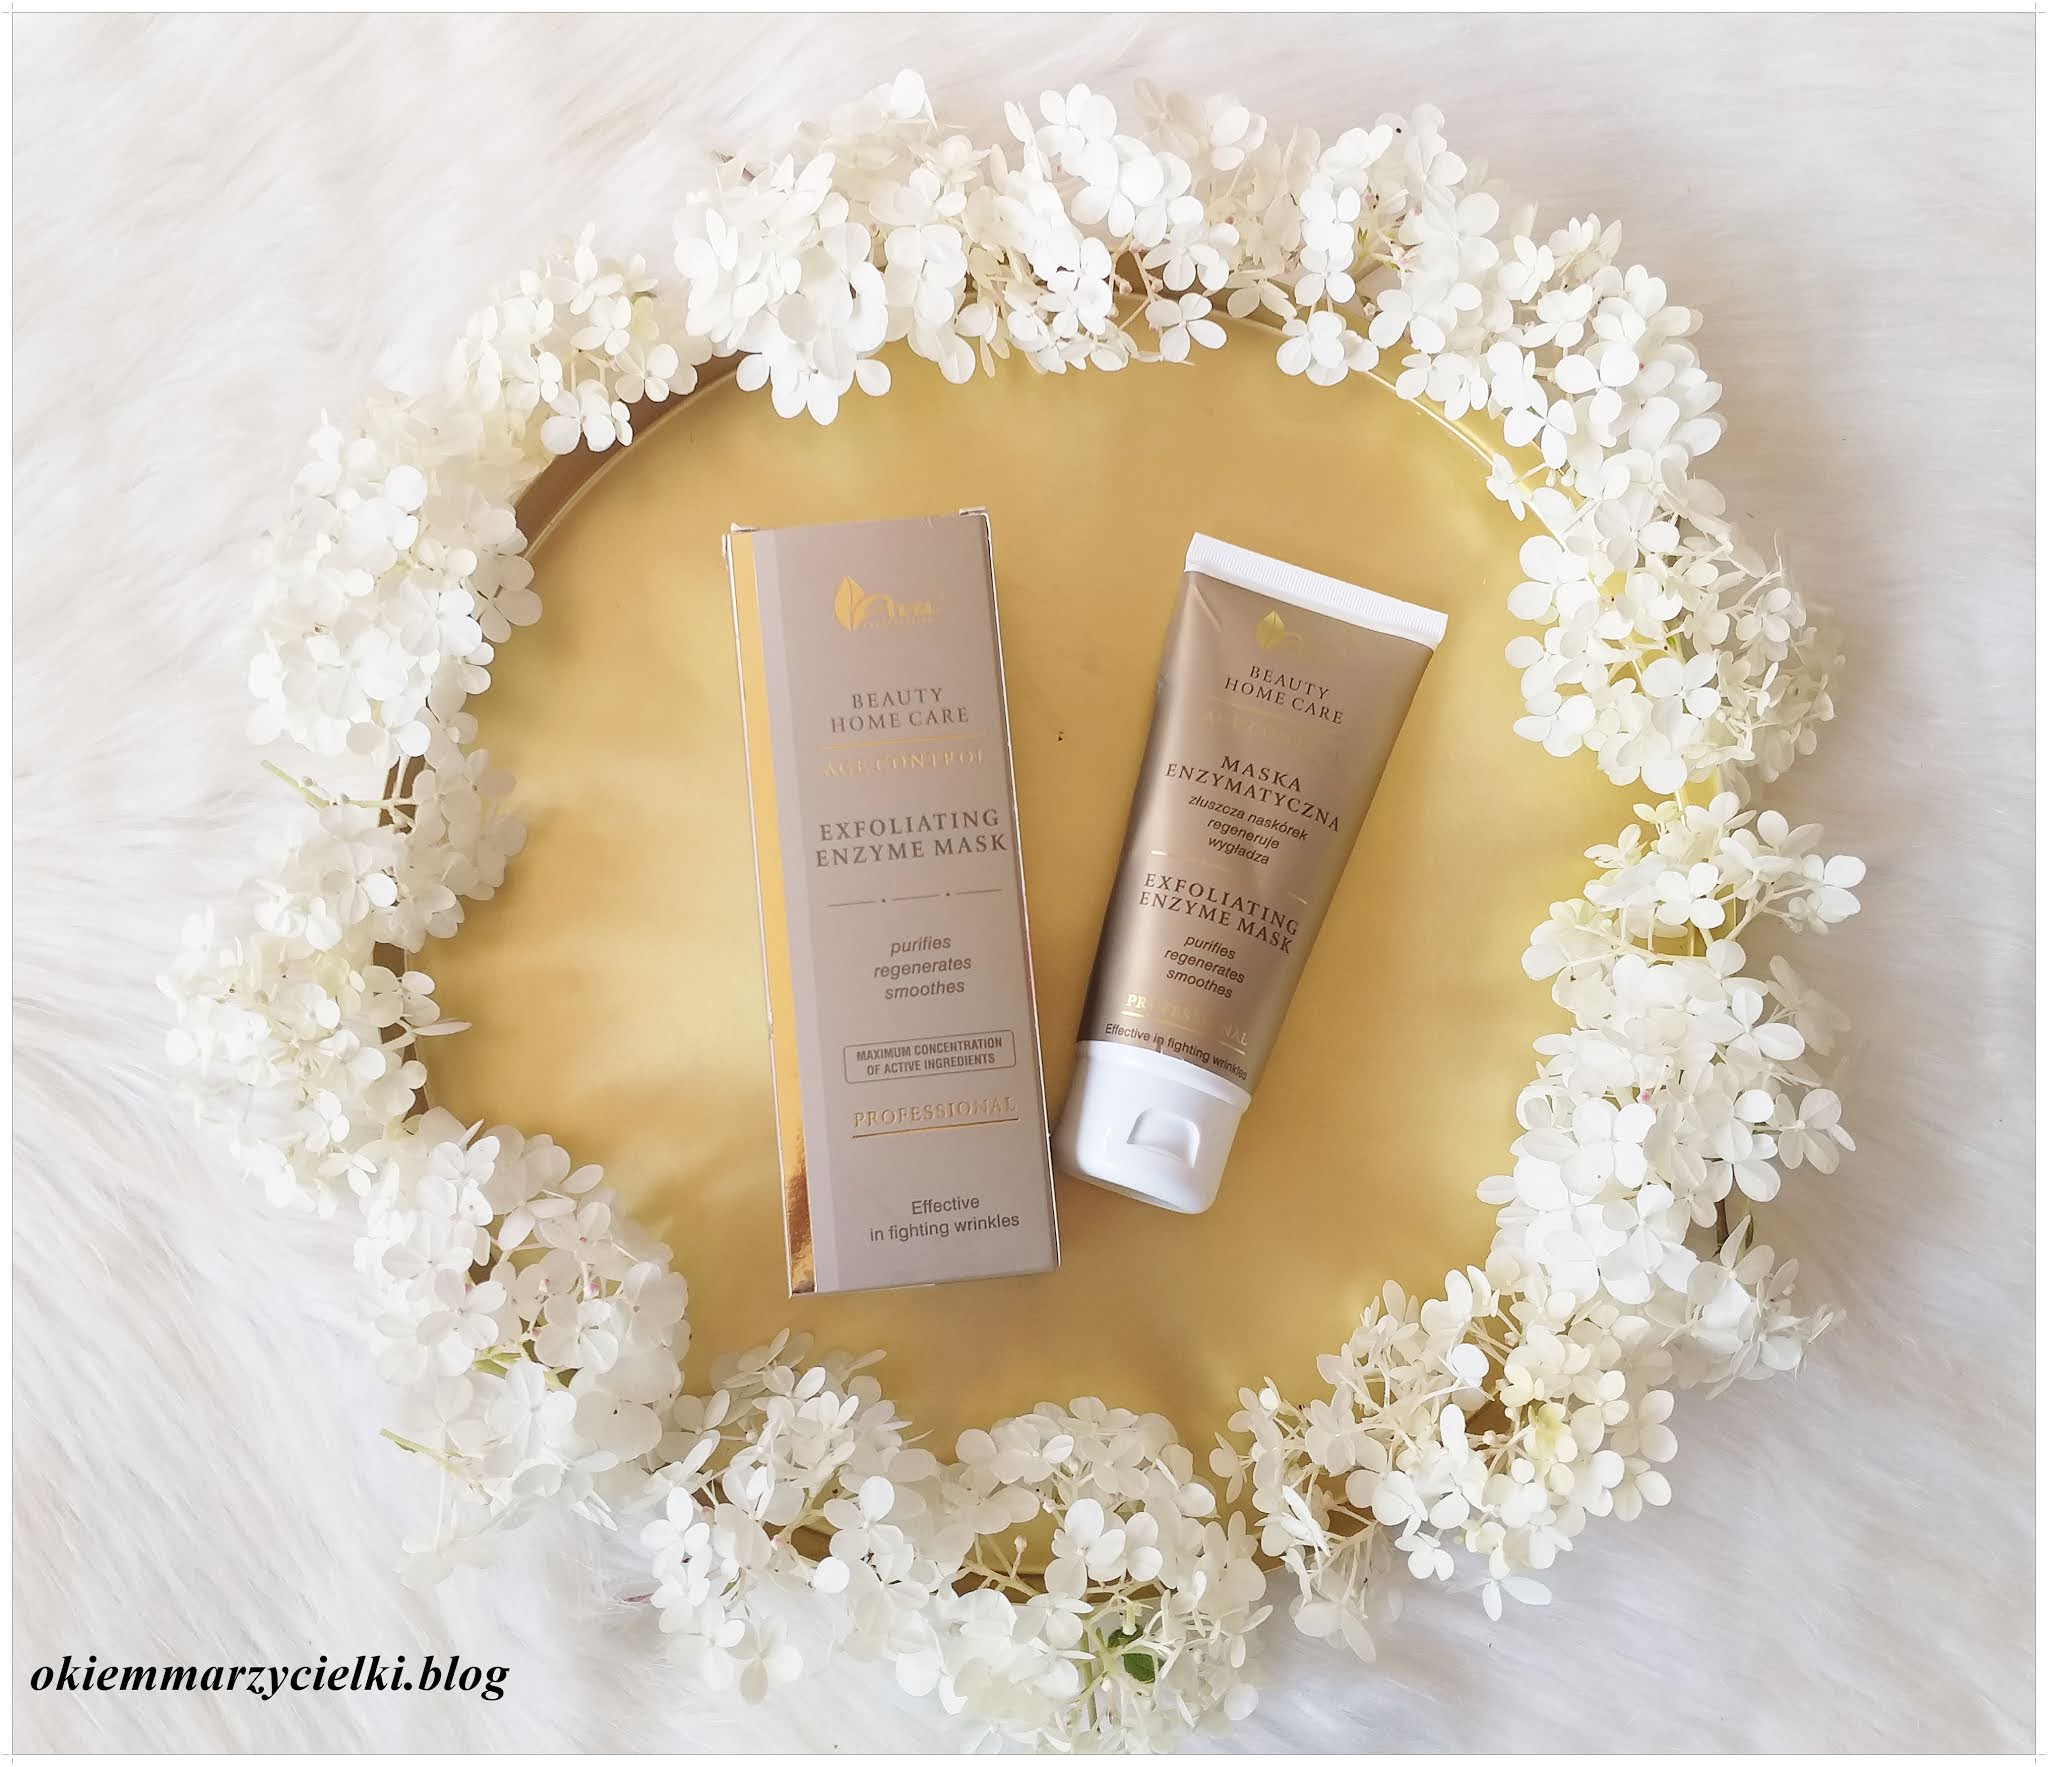 Ava Laboratorium Beauty Home Care-Maska enzymatyczna-recenzja #134